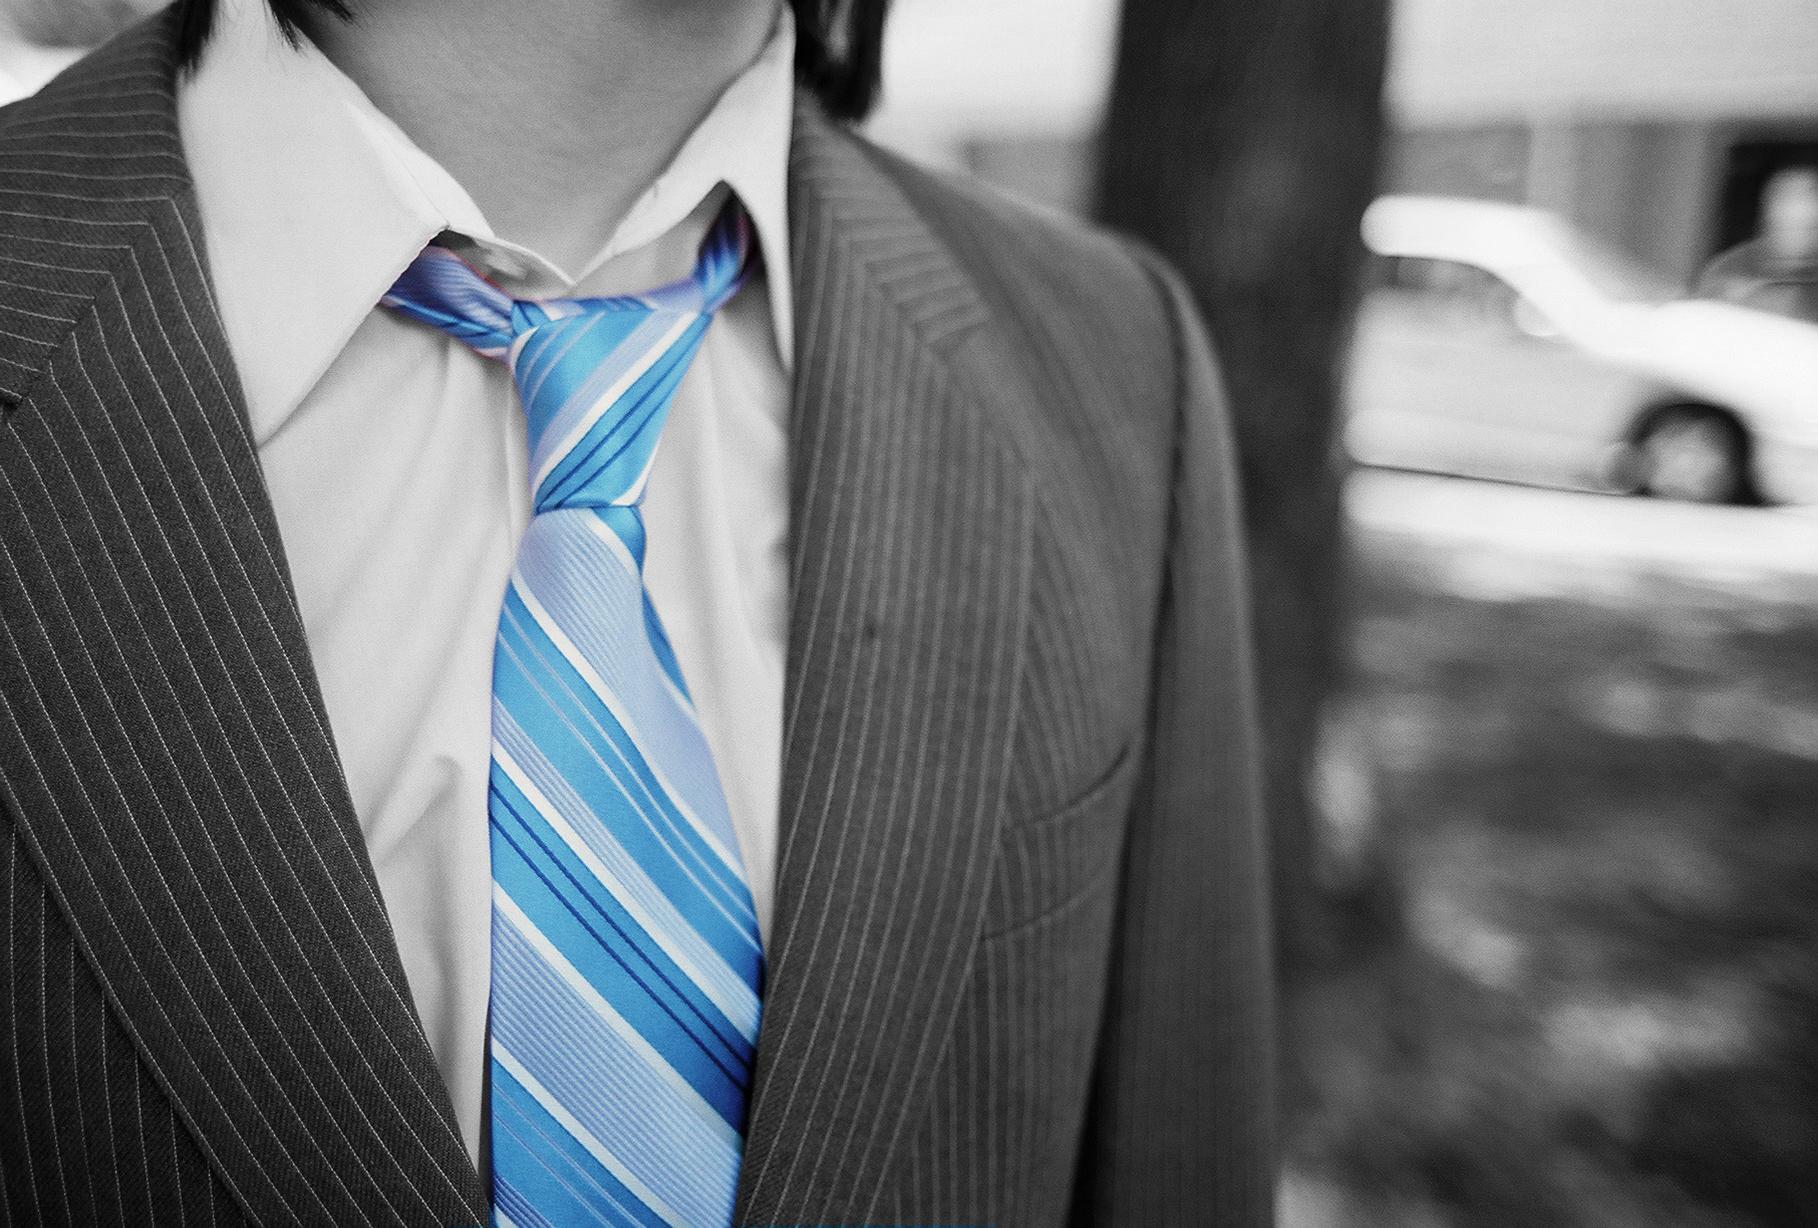 File:Necktie-colour-isolation.jpg - Wikimedia Commons